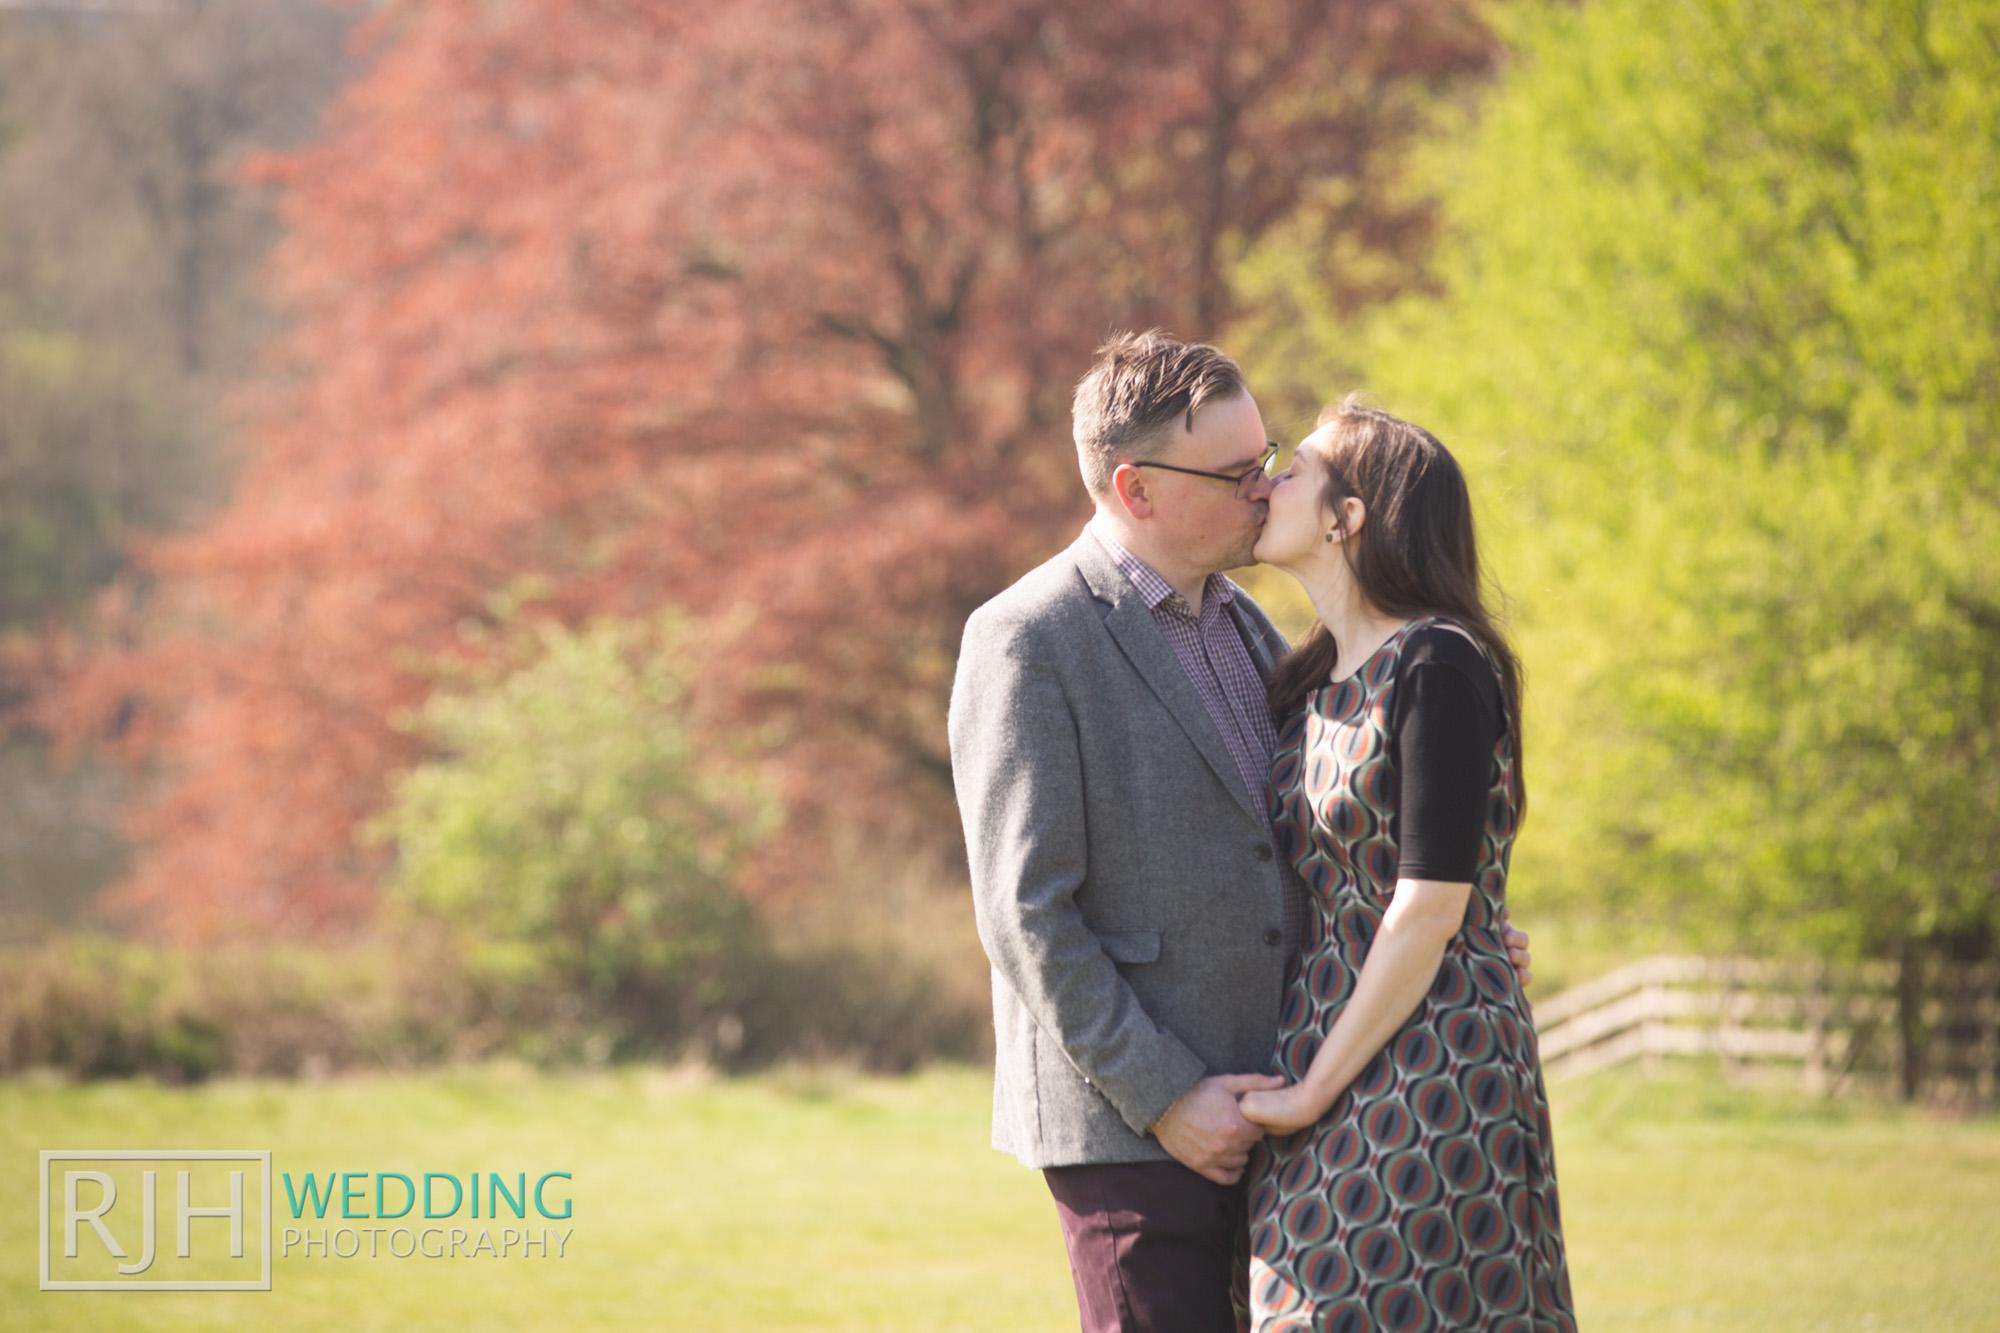 Pre-wedding photography - Richard & Rachel_006_3C2A8135.jpg